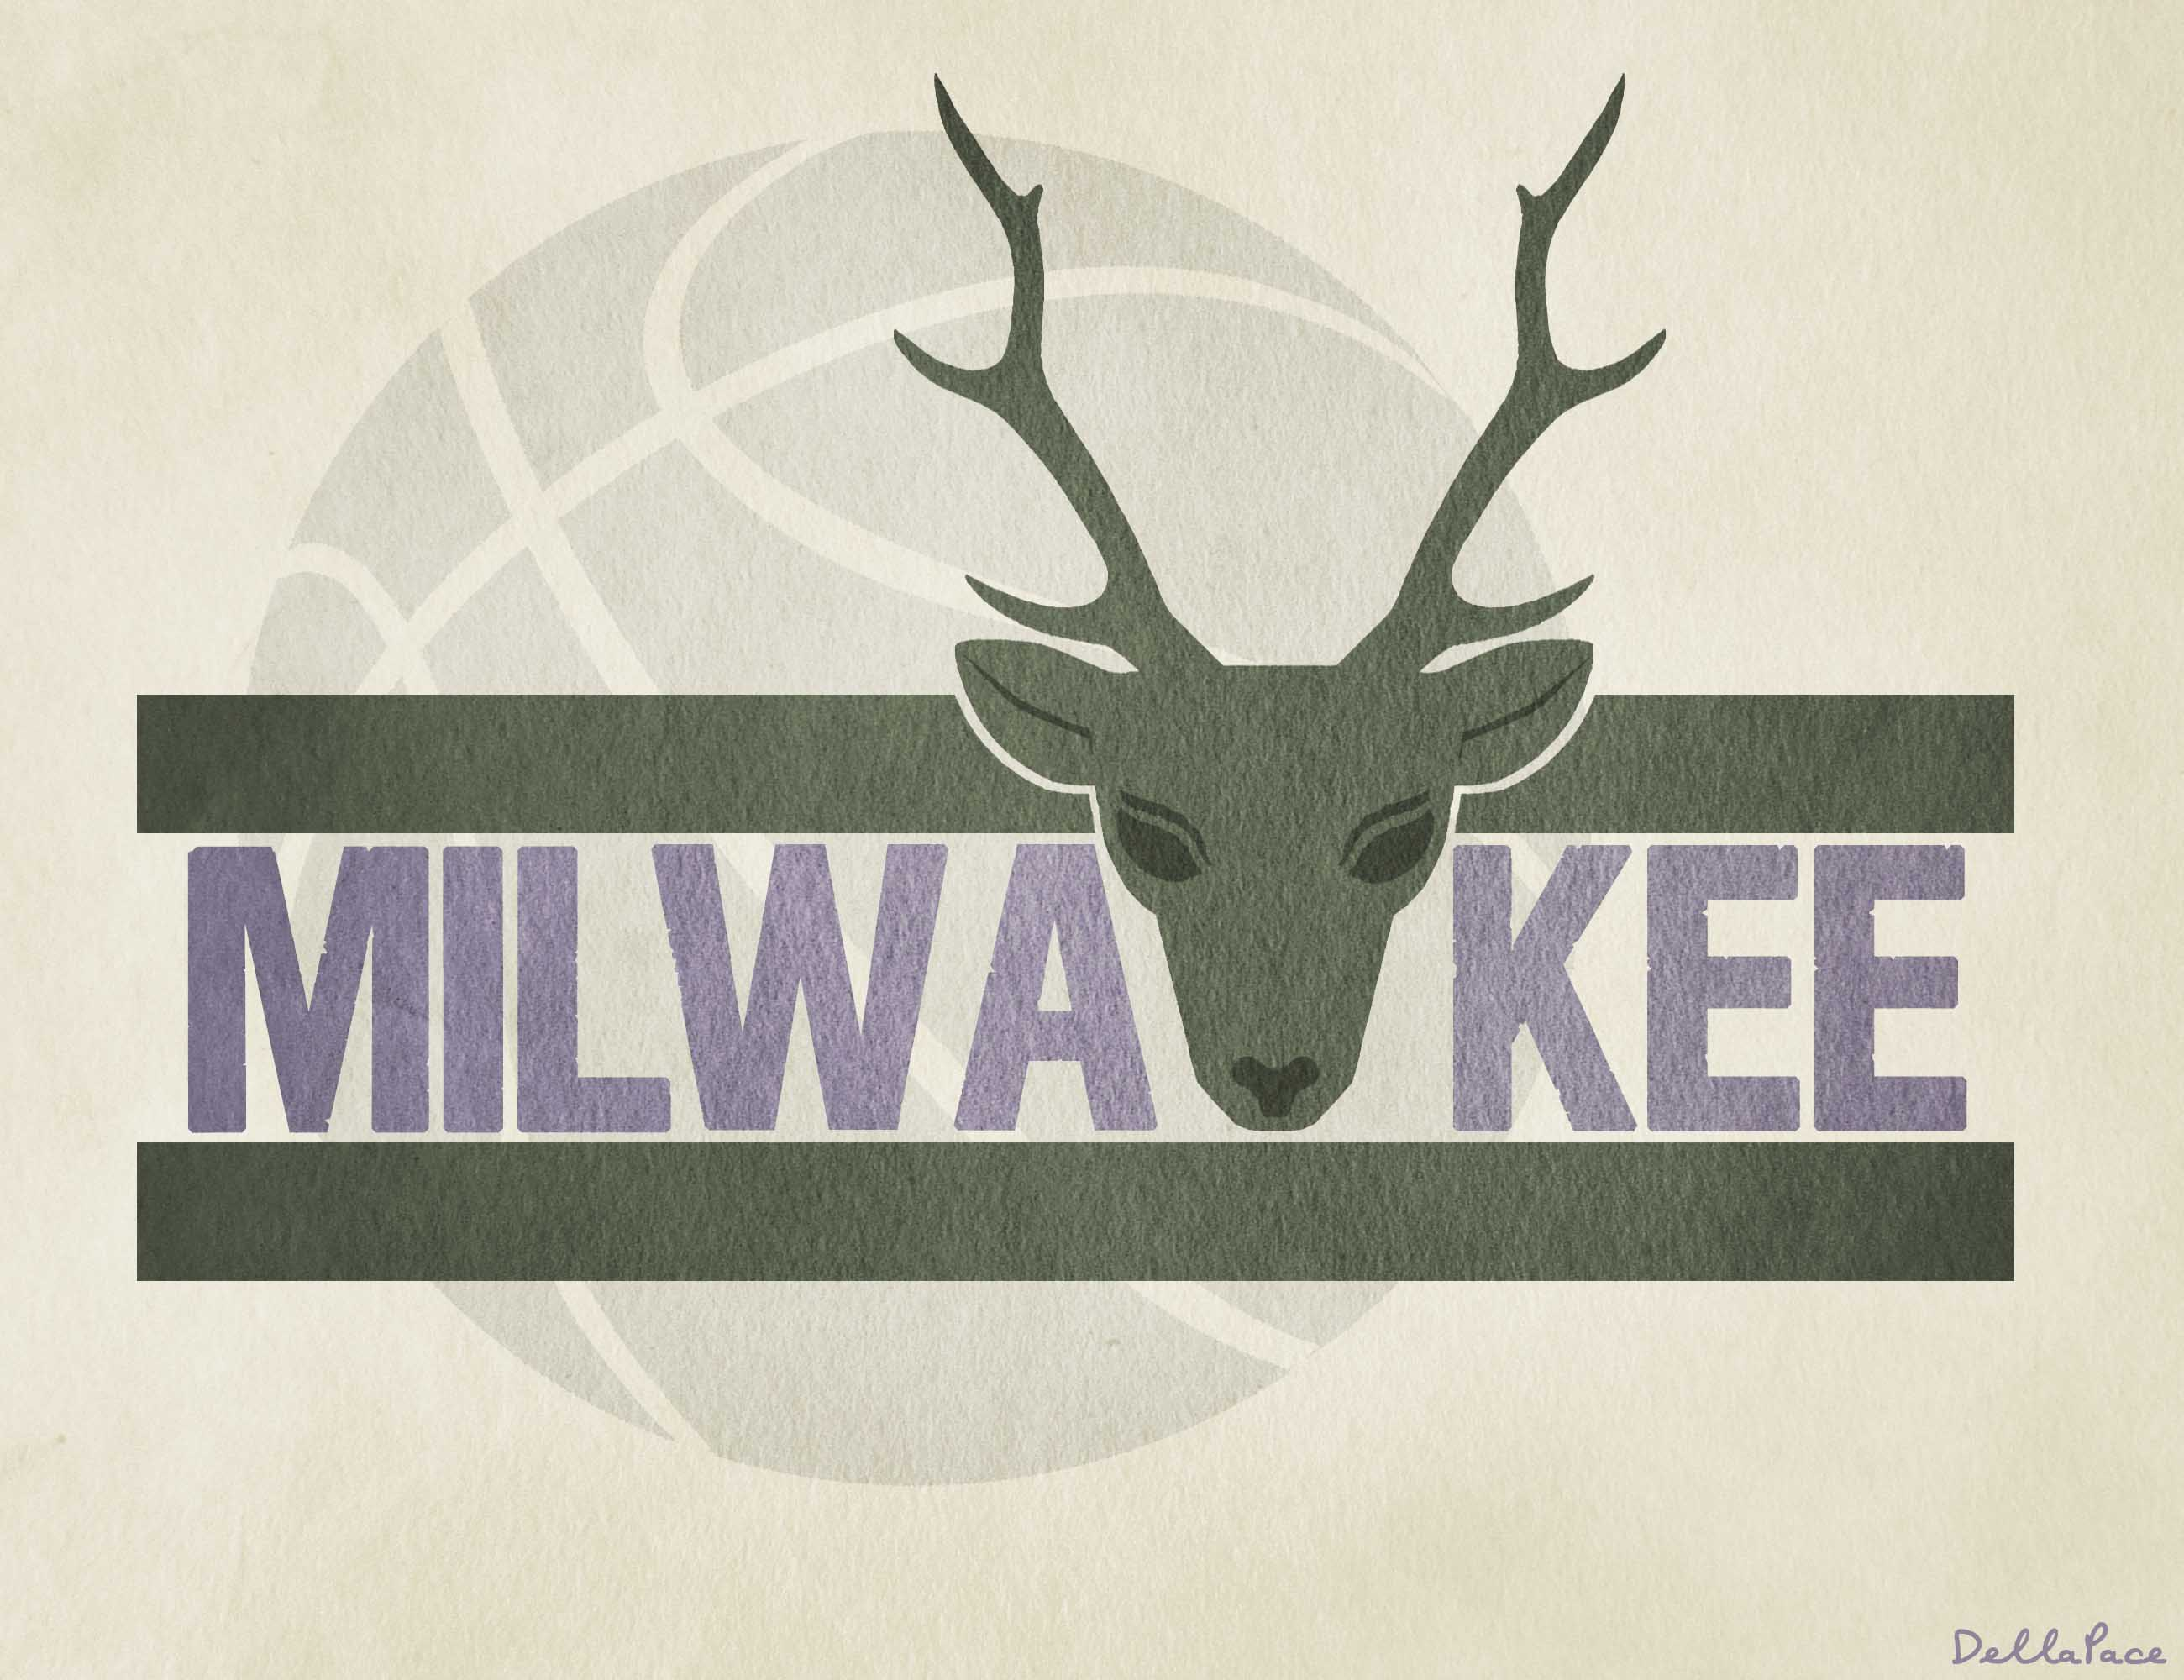 milwaukee bucks nba basketball 5 wallpaper 2600x2000